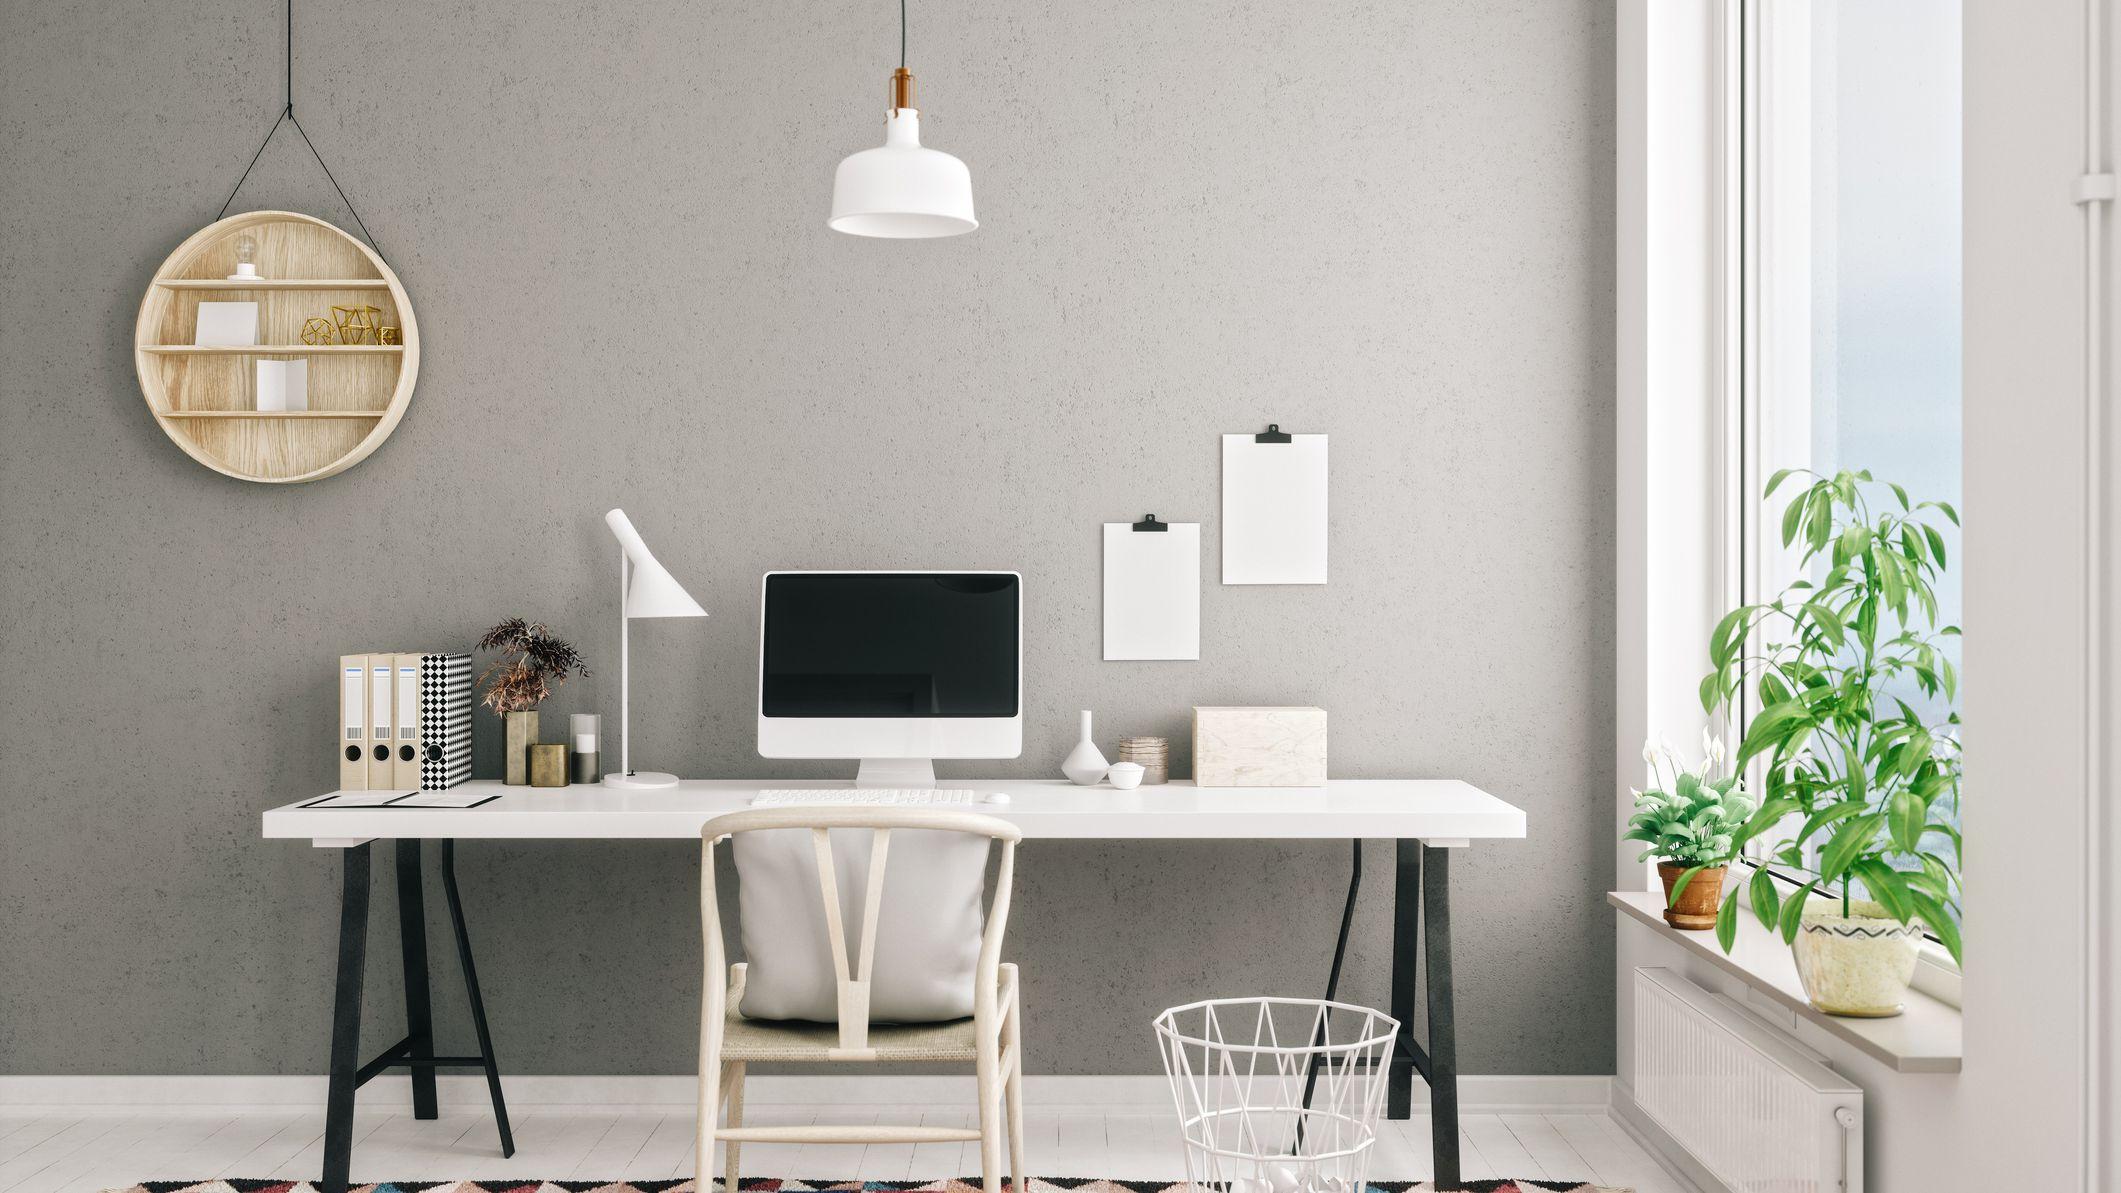 rustic home decor catalogs decor ideasdecor ideas.htm ideas for starting a home decor business  ideas for starting a home decor business